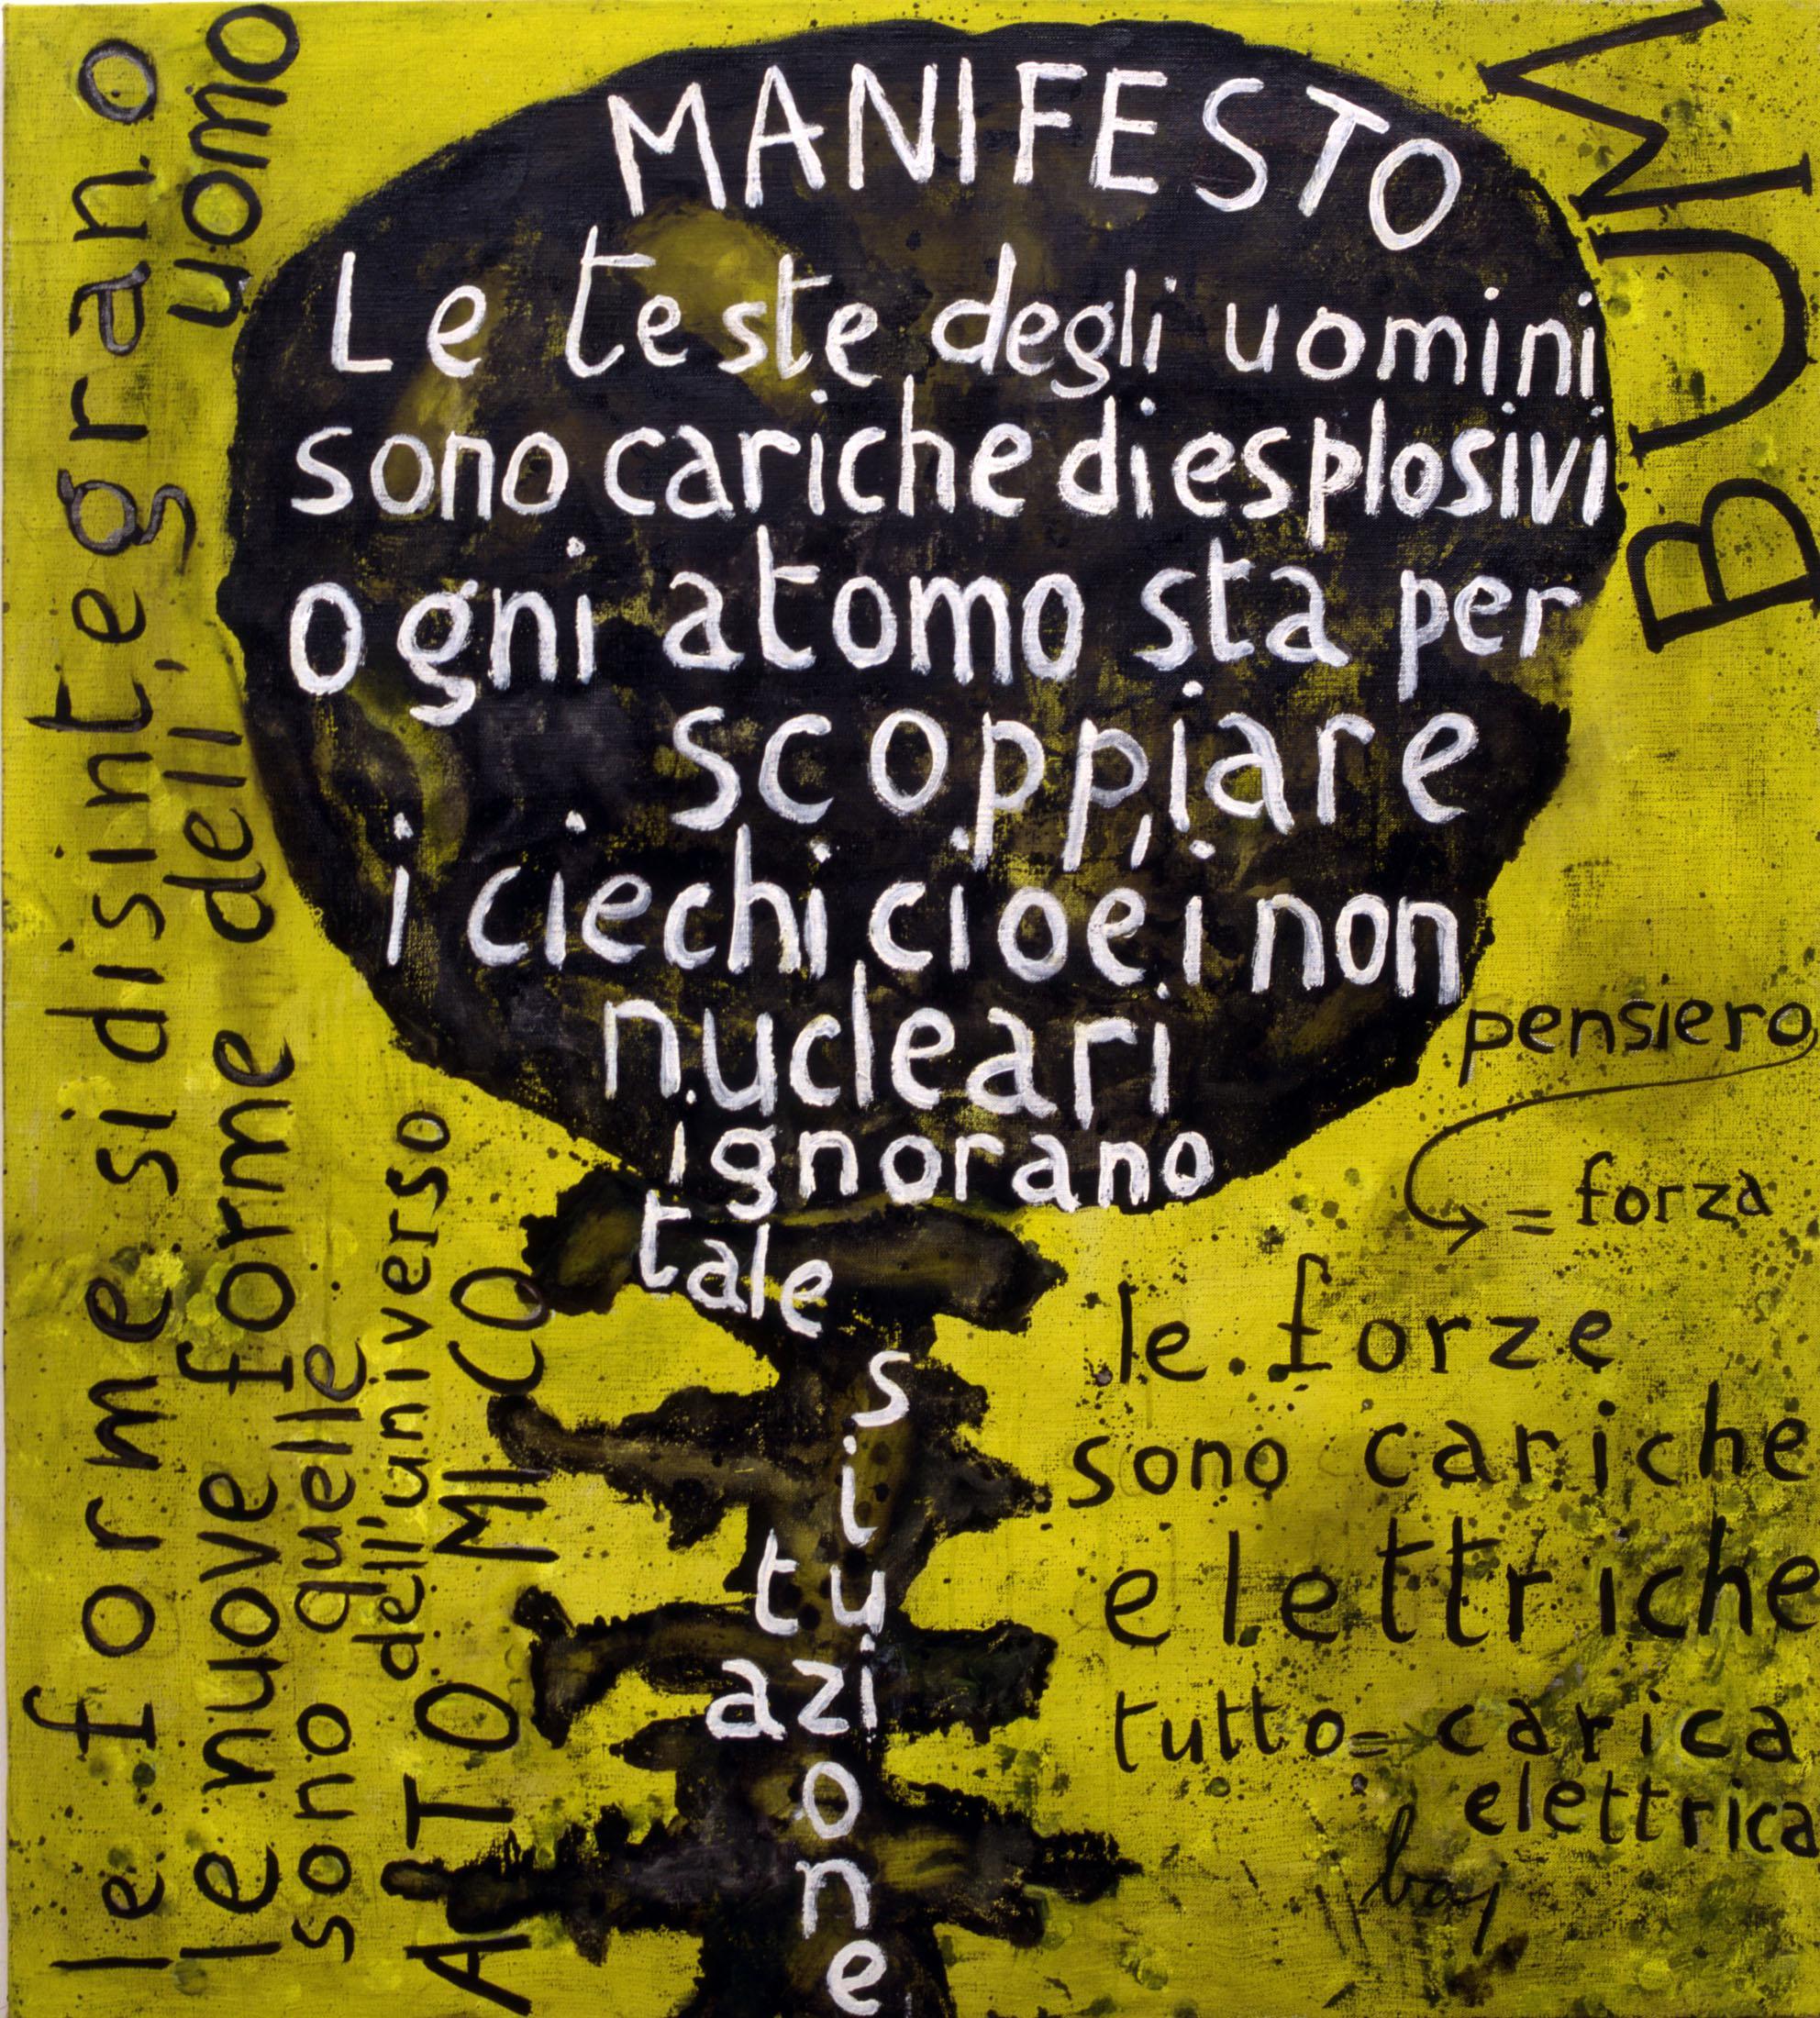 Enrico Baj, Manifesto Nucleare, 1952